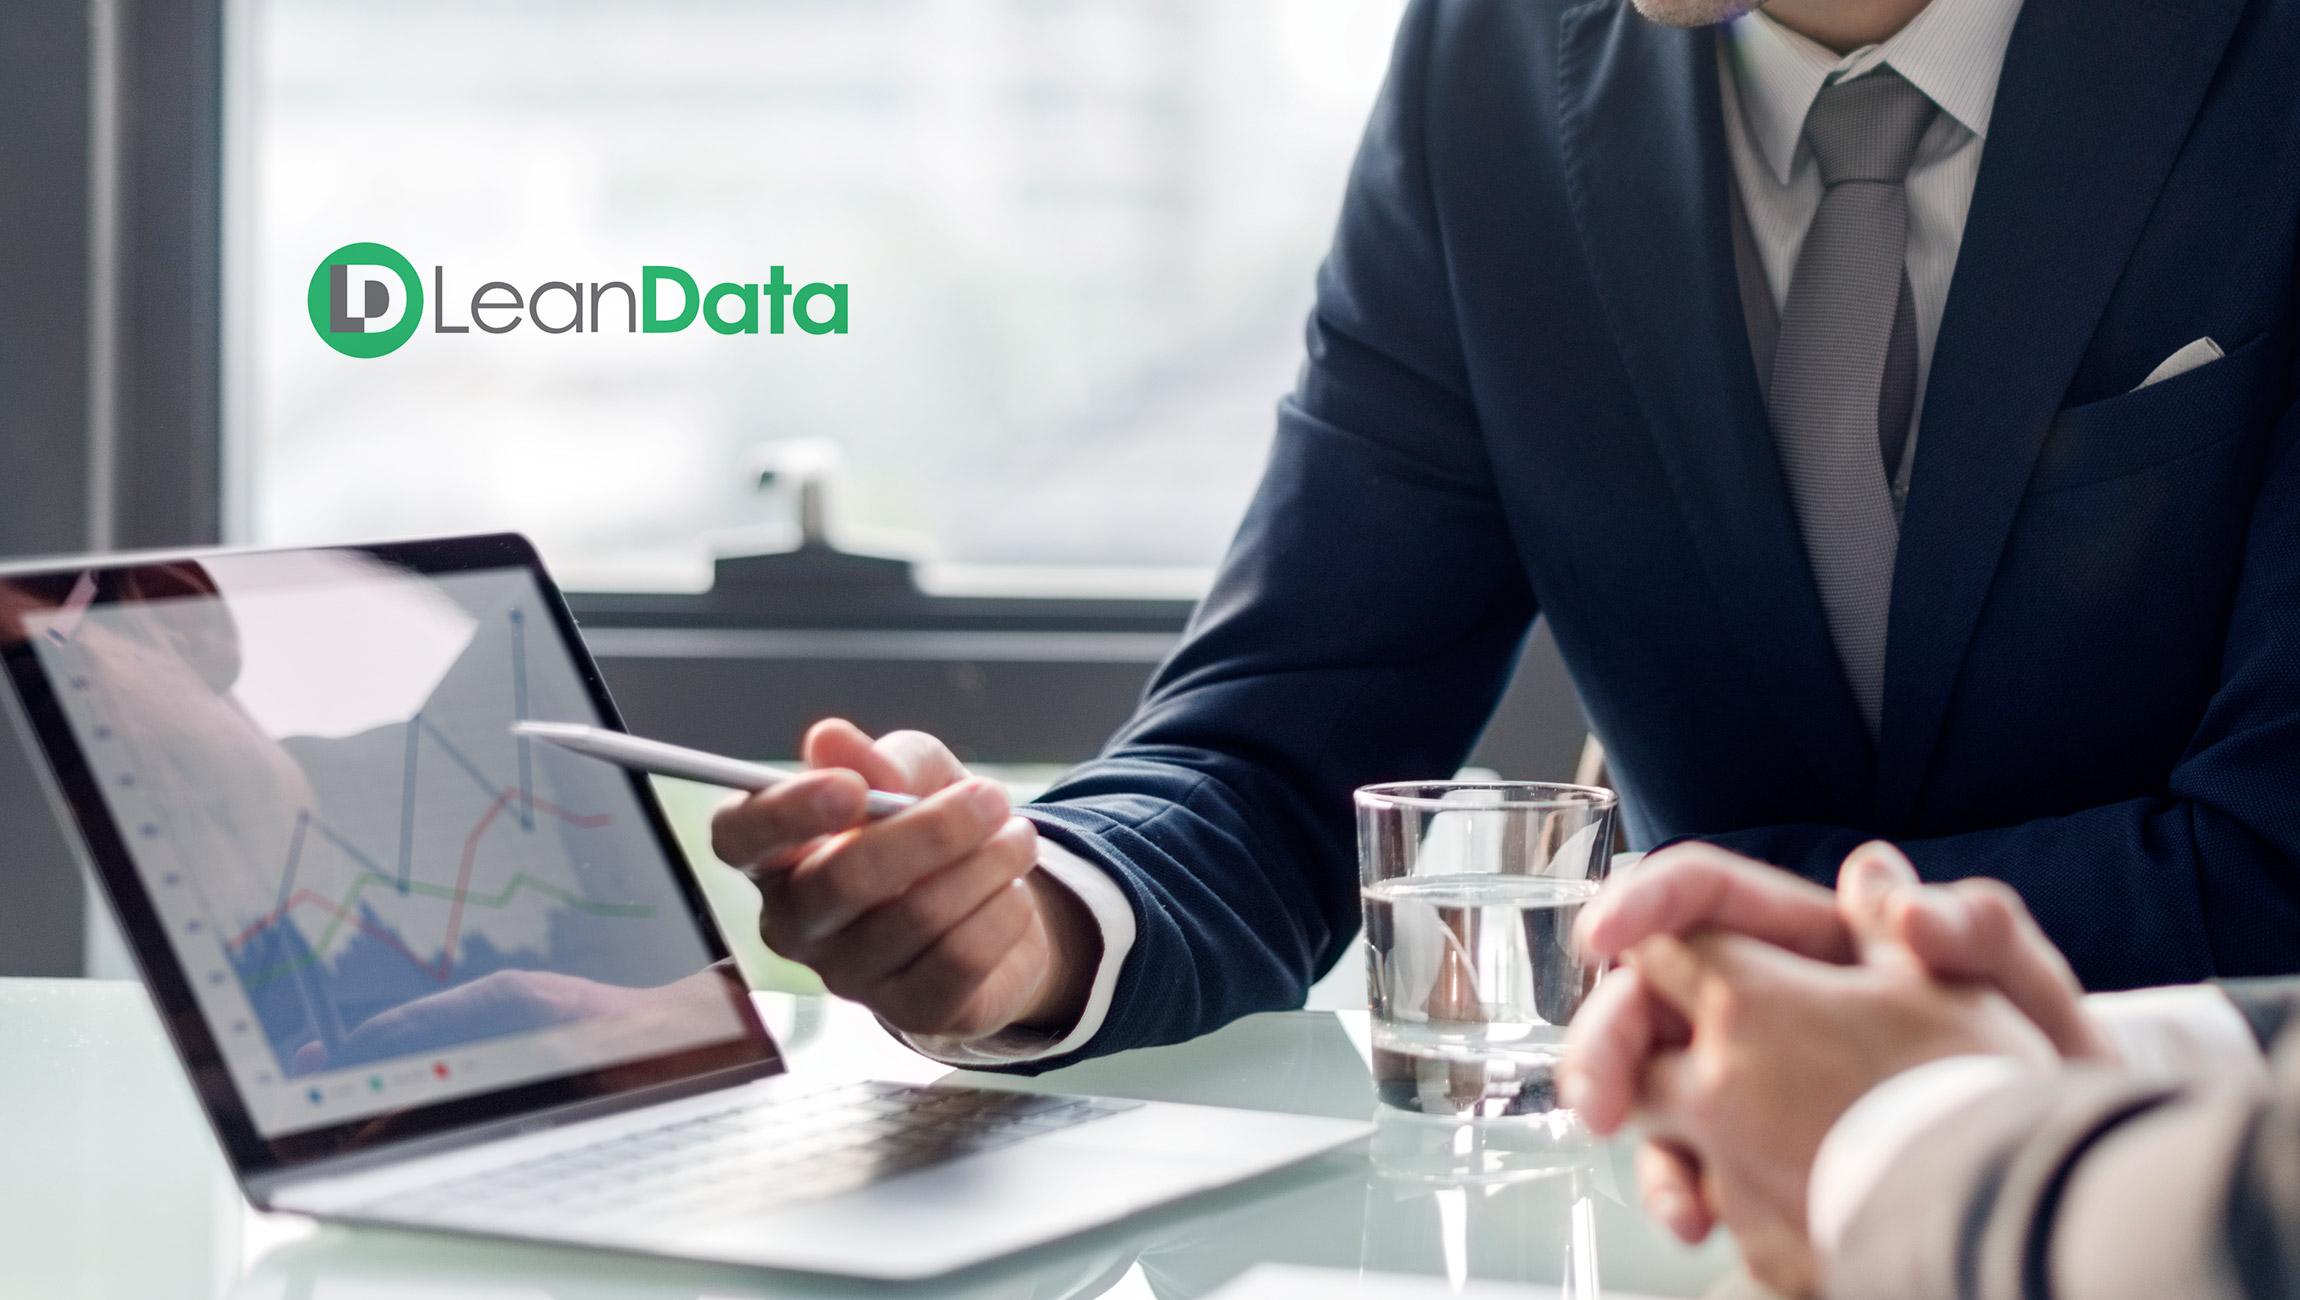 LeanData Raises $27.5 Million in Series C Funding Following Record Growth